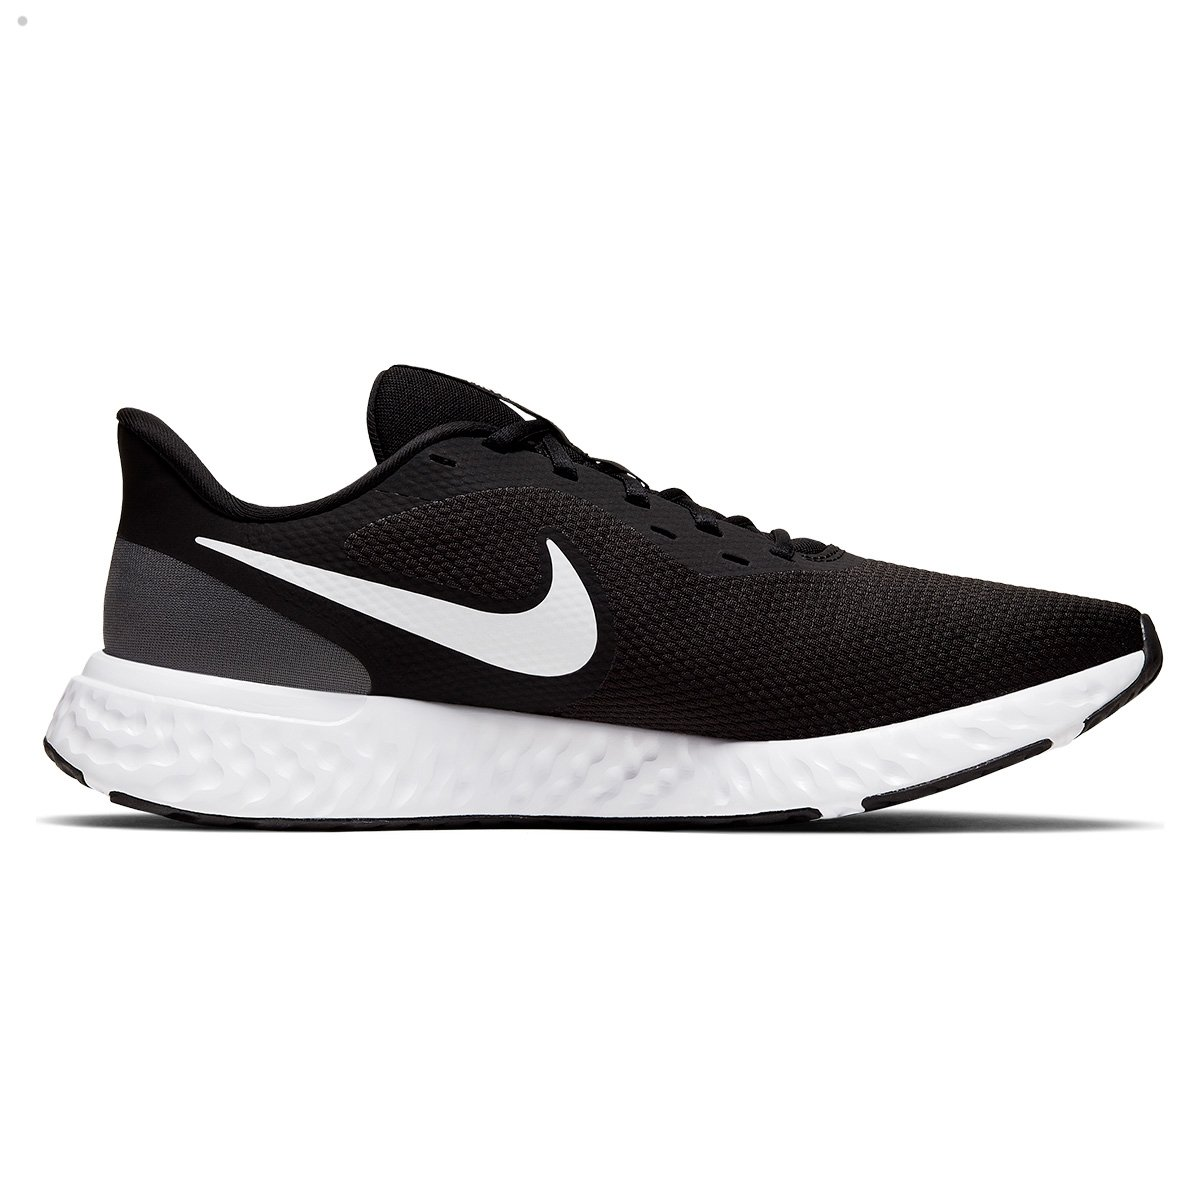 Tênis Nike Revolution 5 Masculino - Tam: 42 - 2